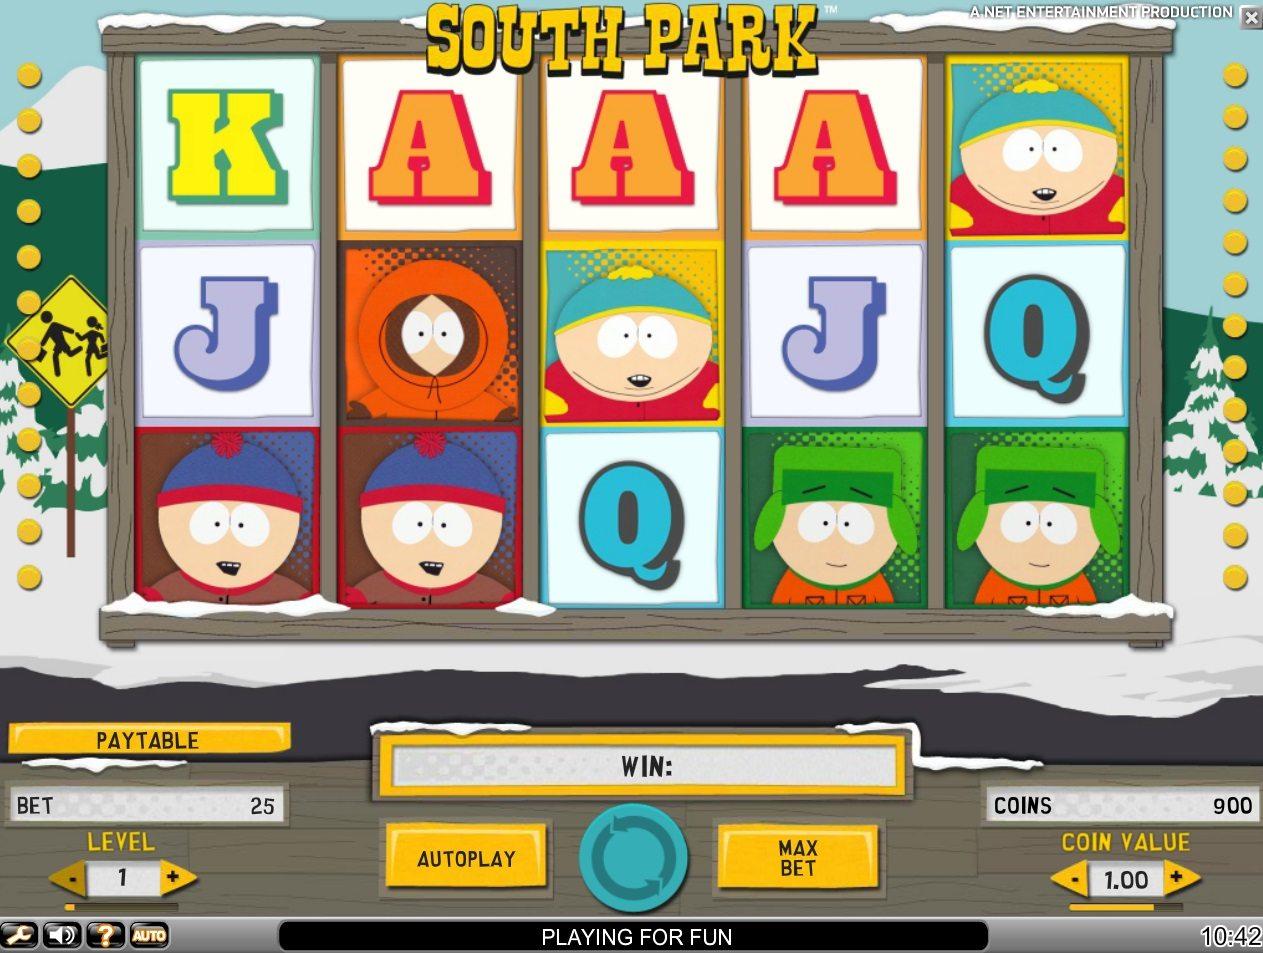 South Park2